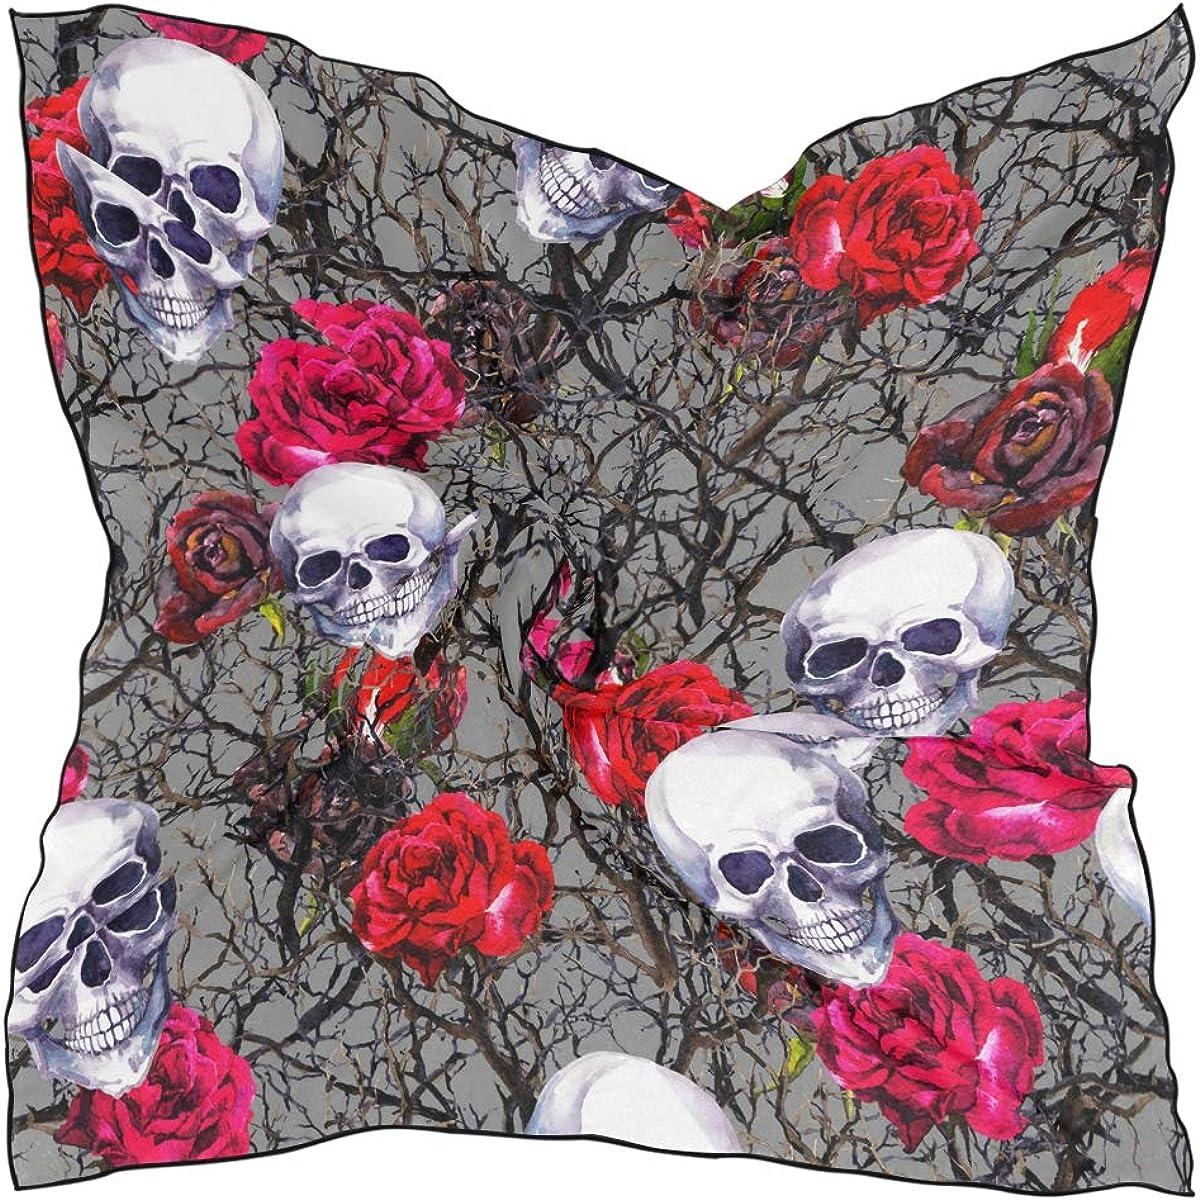 XLING Fashion Square Scarf Vintage Floral Flower Rose Skull Lightweight Sunscreen Scarves Muffler Hair Wrap Headscarf Neckerchief for Women Men